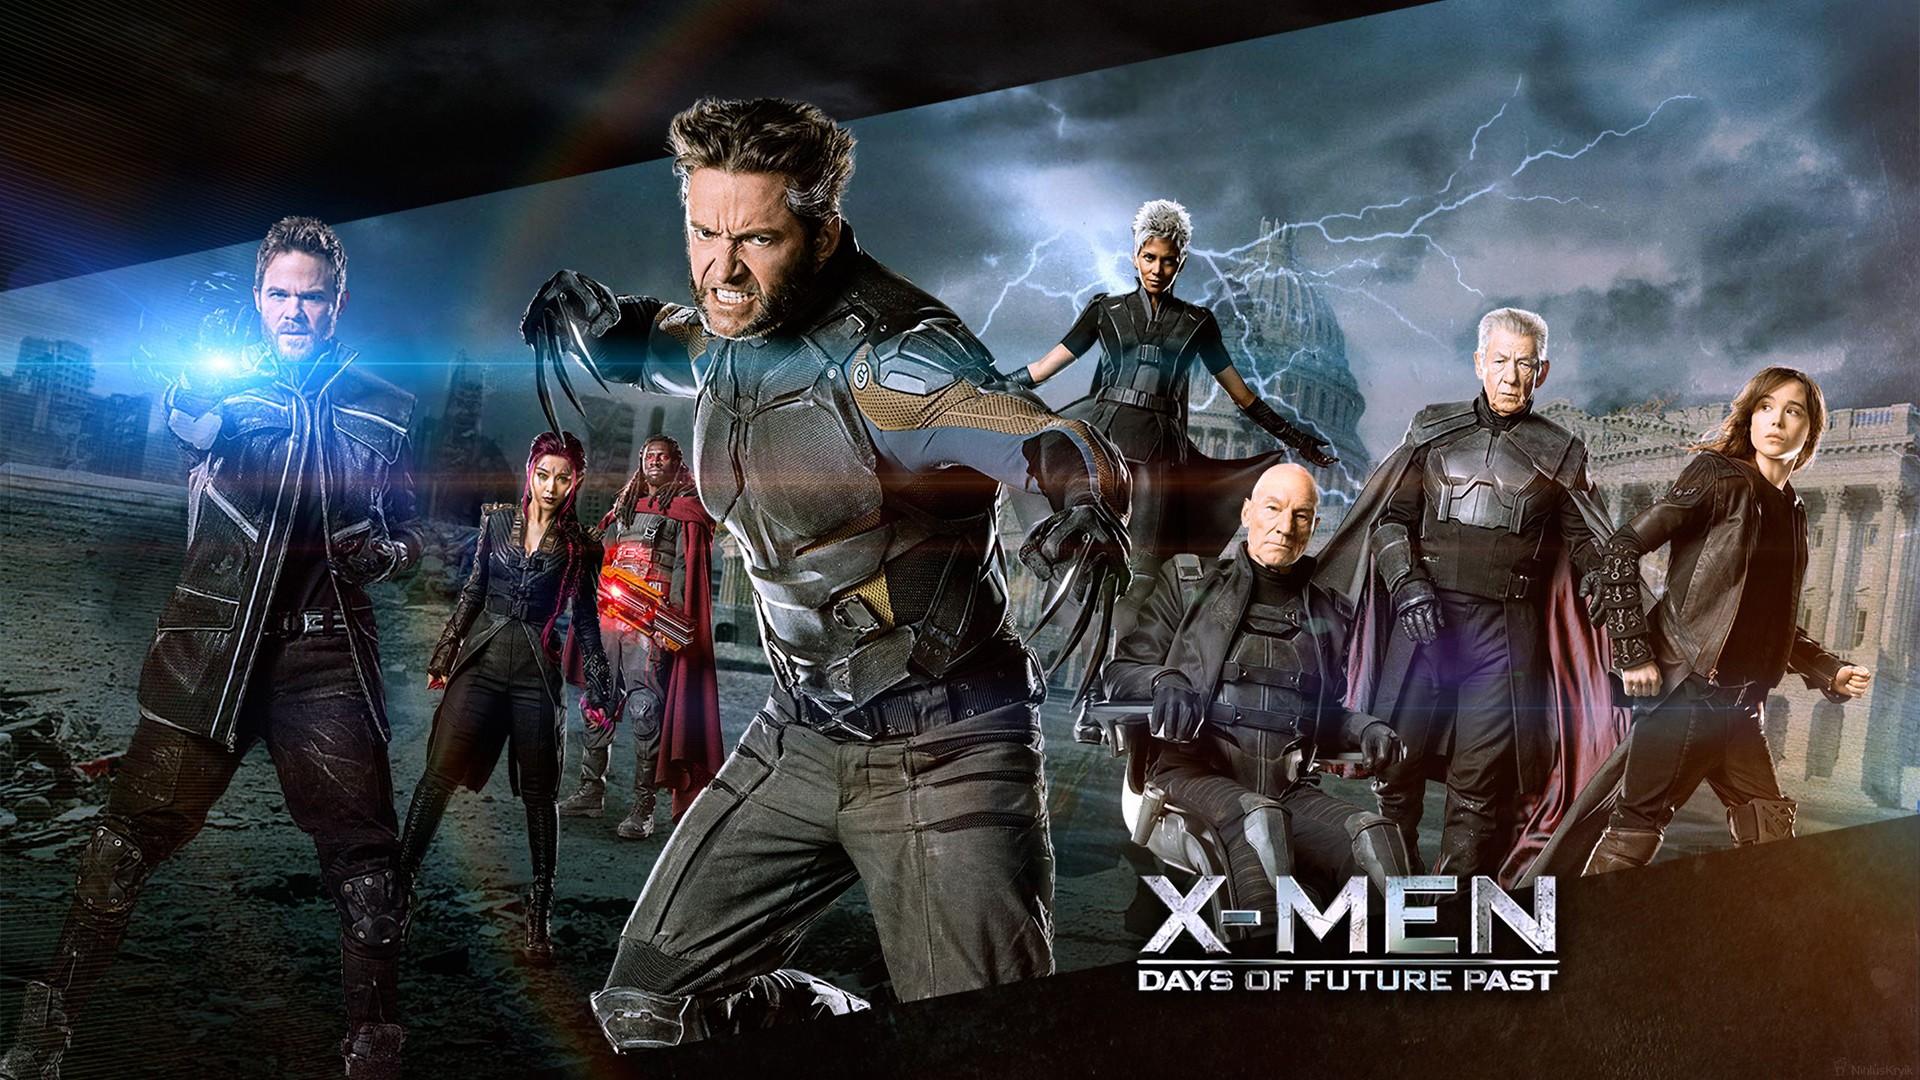 x-men-days-of-future-past-WideWallpapersHD-2014-05-13-02_00017.jpg